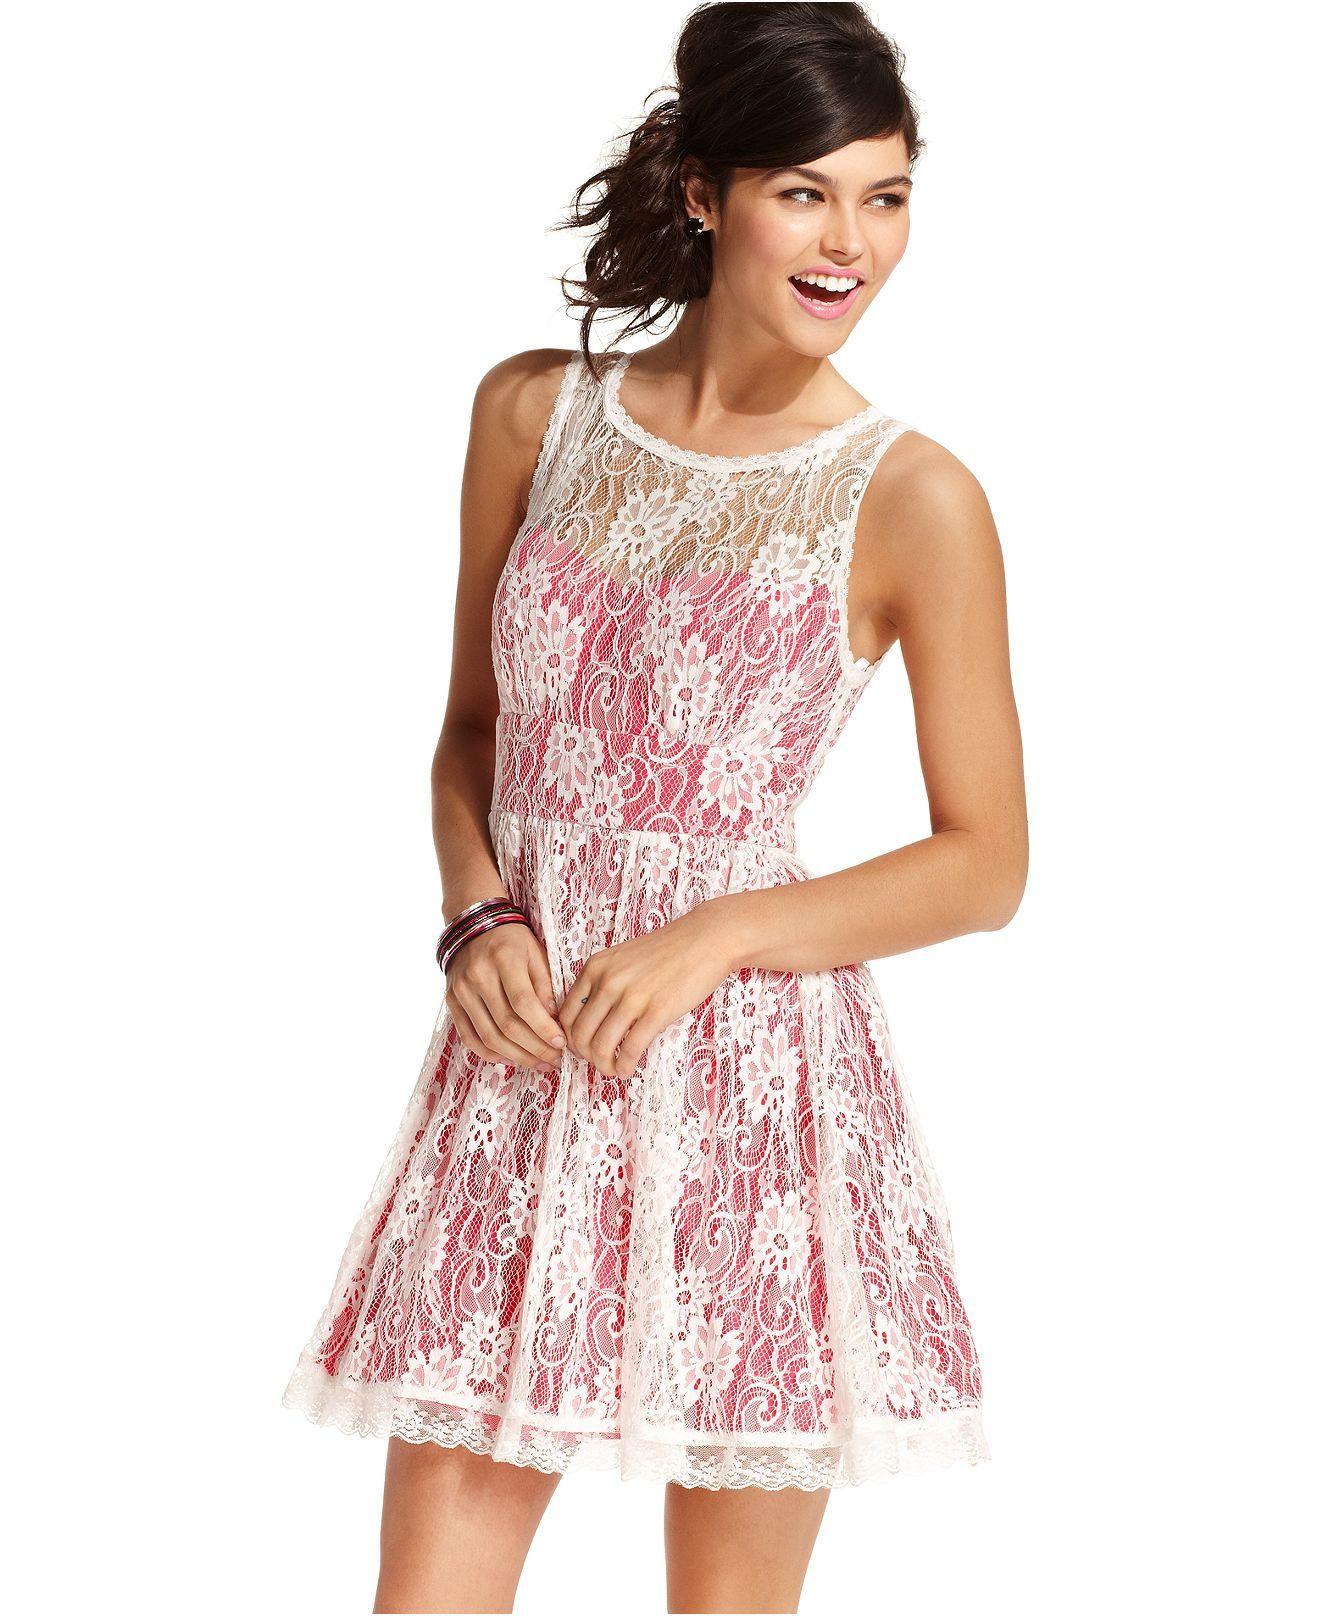 B Darlin Juniors Dress, Sleeveless Lace A-Line - Juniors Dresses ...